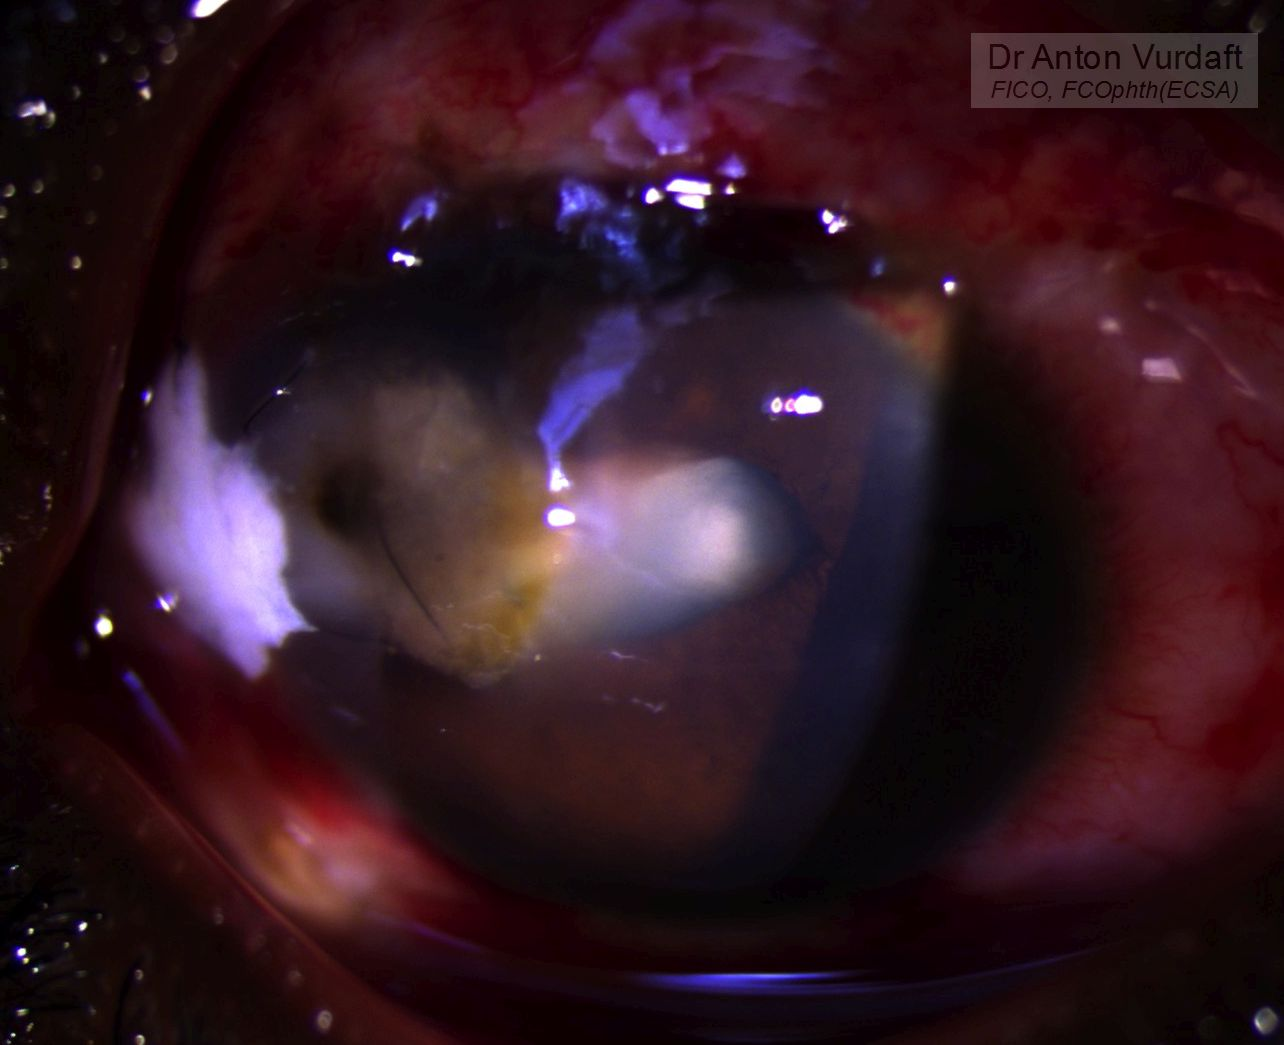 Fish-hook eye perforation - corneal scar and traumatic cataract